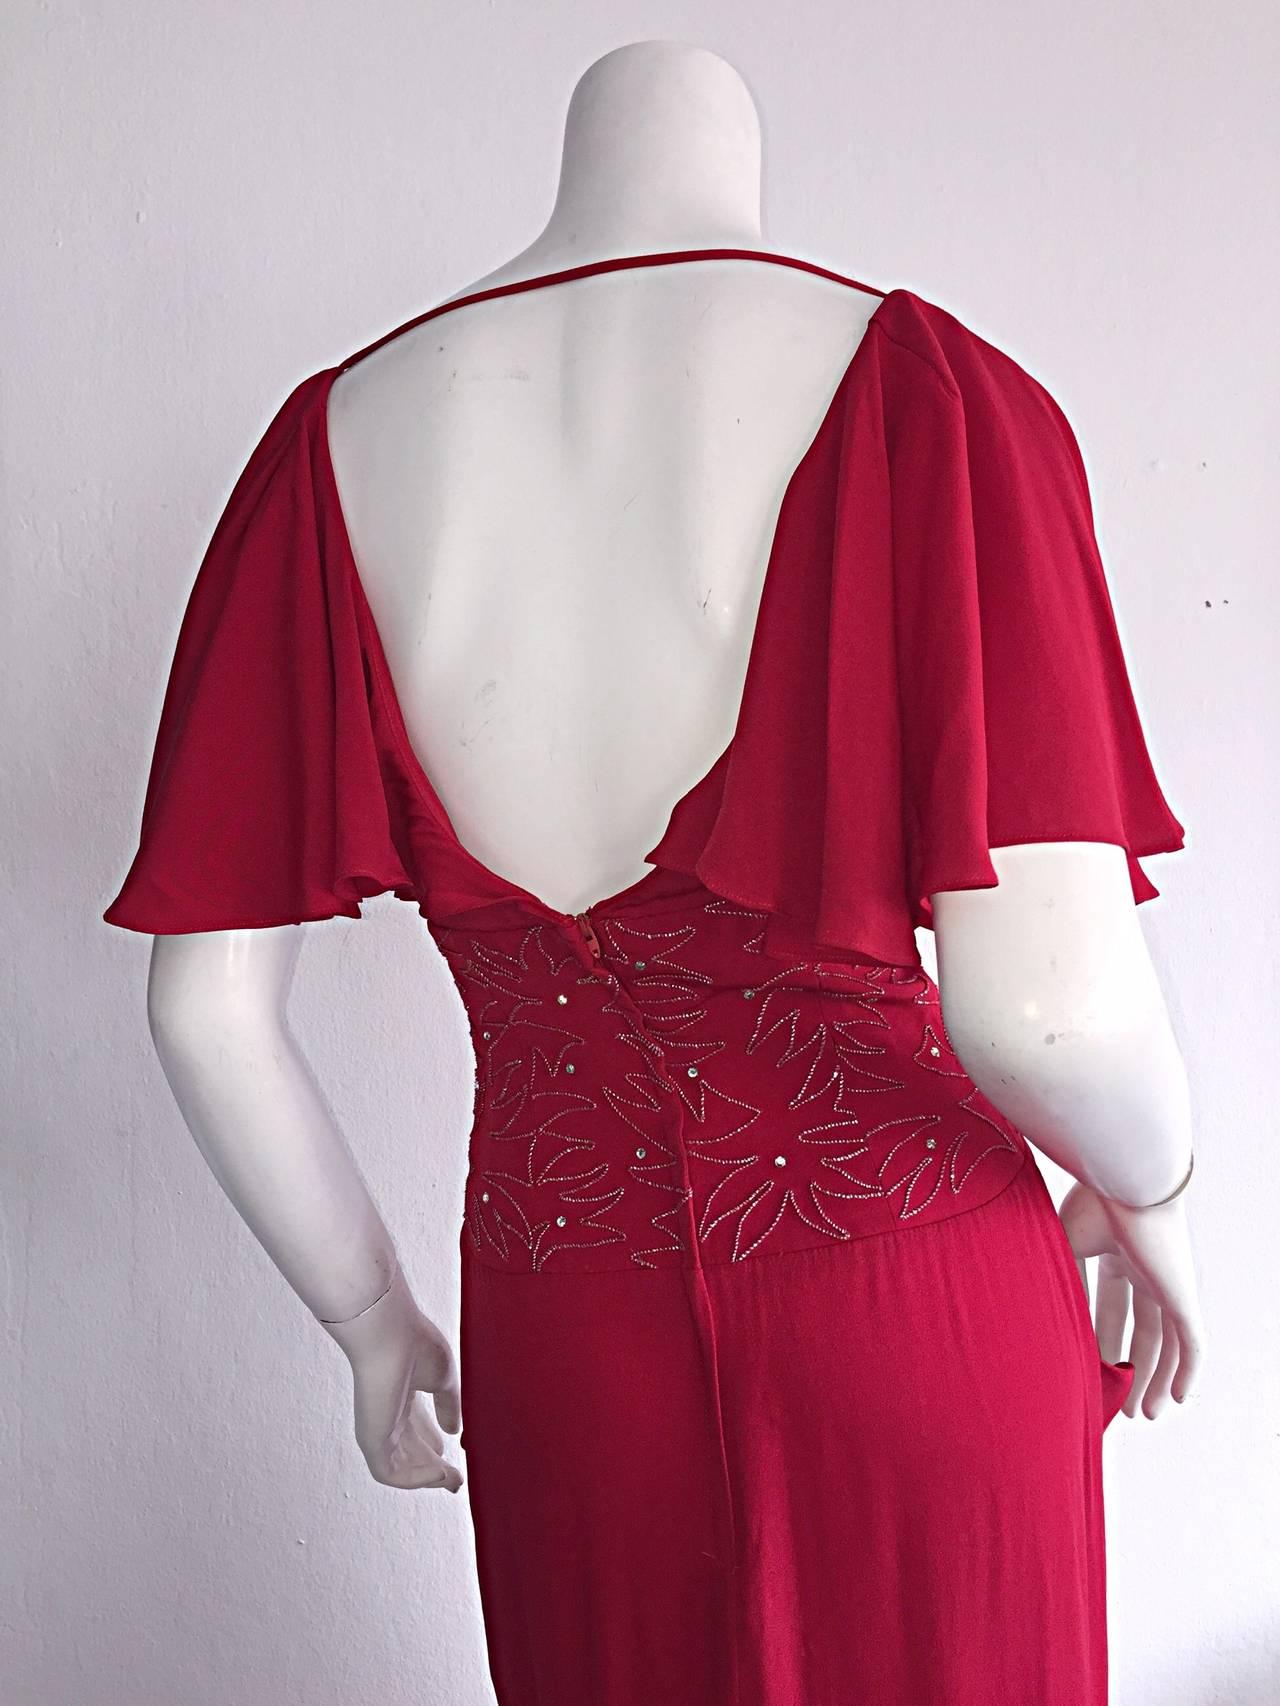 Beautiful Vintage Eletra Casadei Lipstick Red Flutter Dress w/ Rhinestones For Sale 2